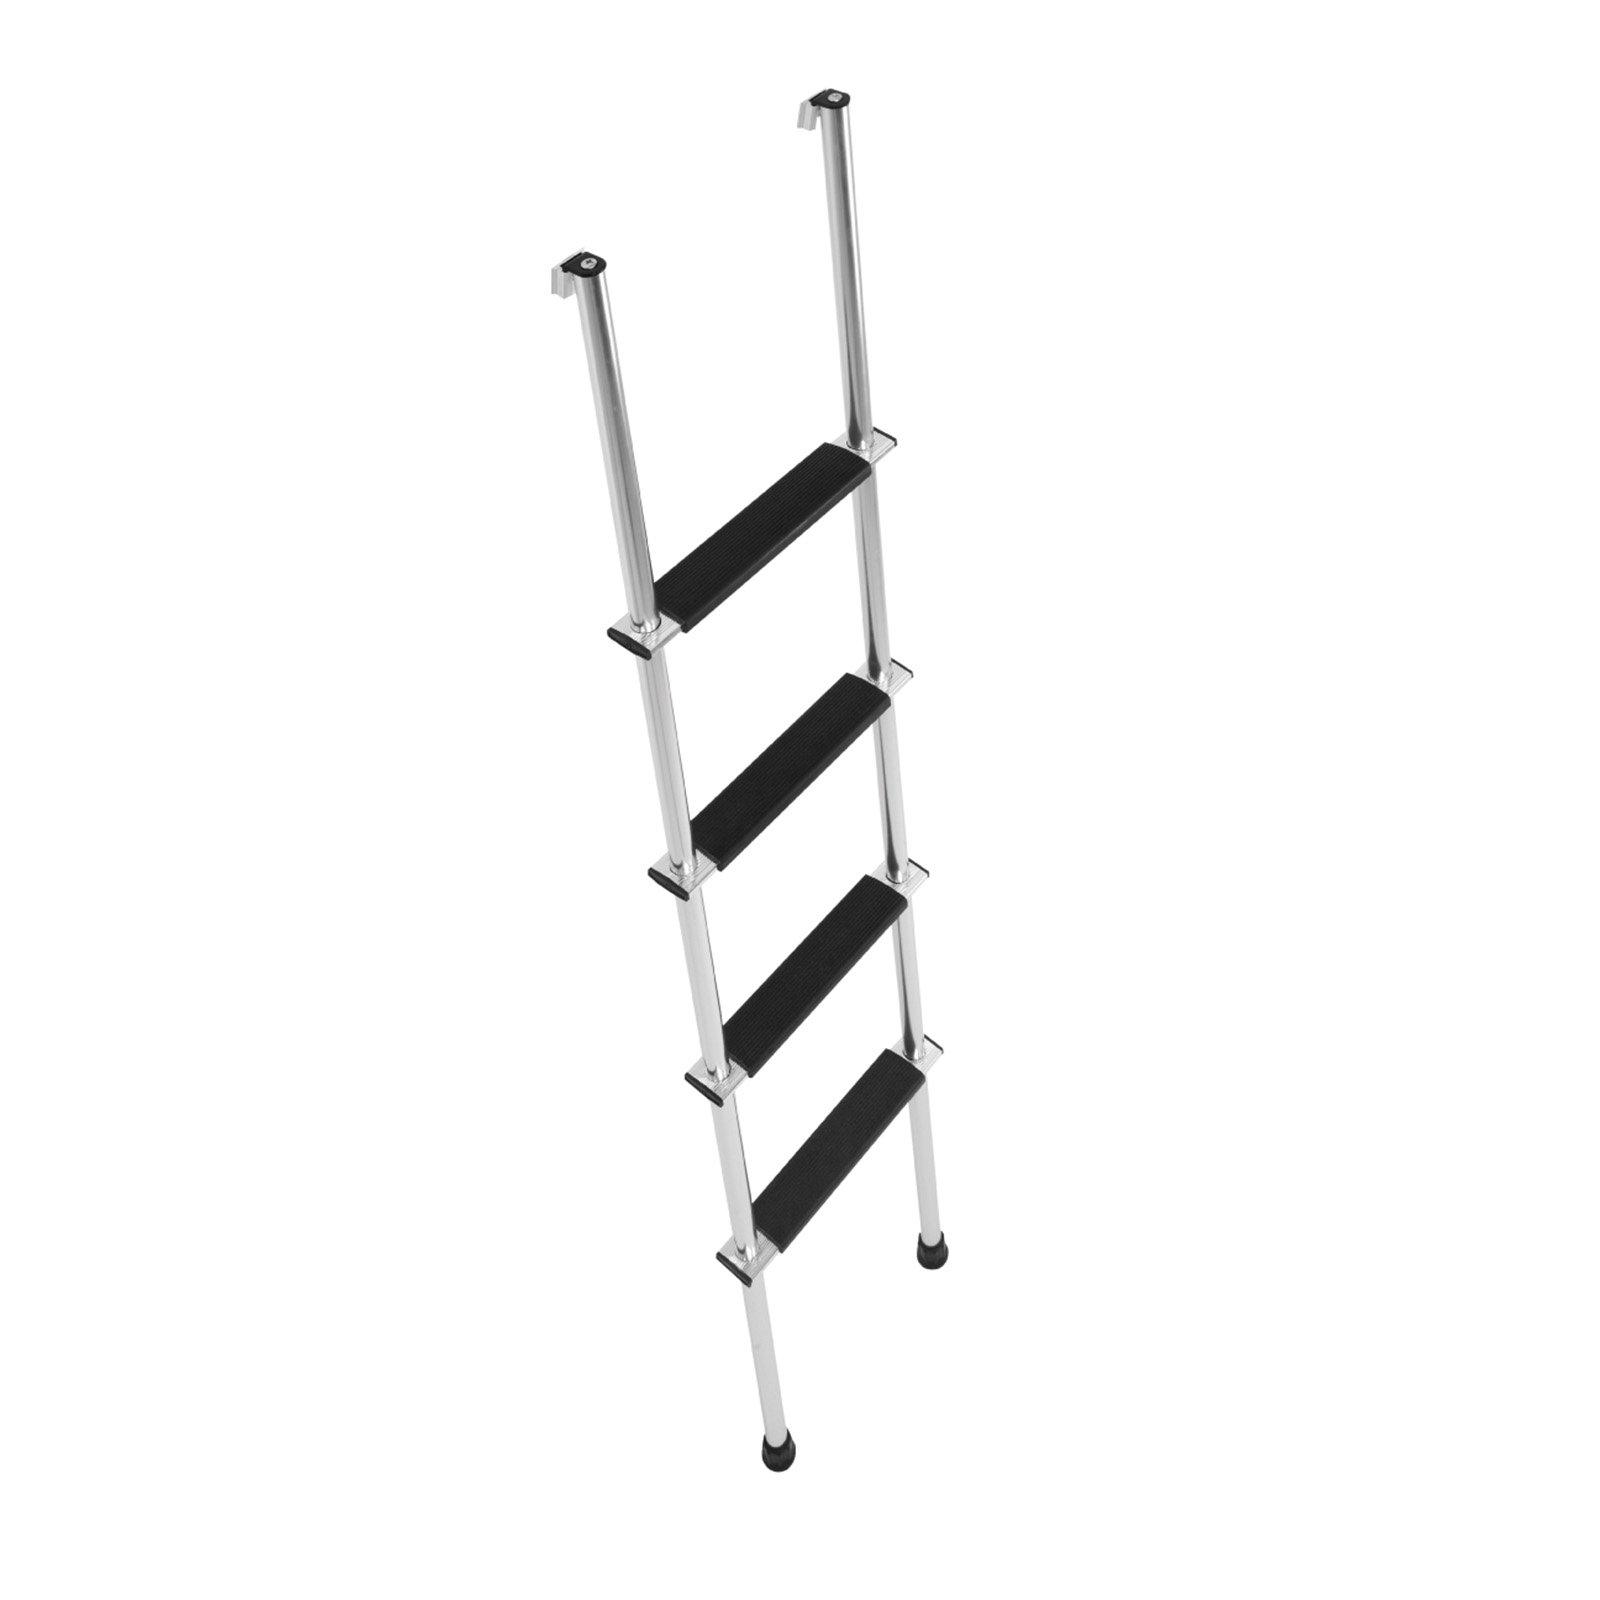 Stromberg Carlson 60 Inch LA-460 Bunk Ladder-60 by Stromberg Carlson